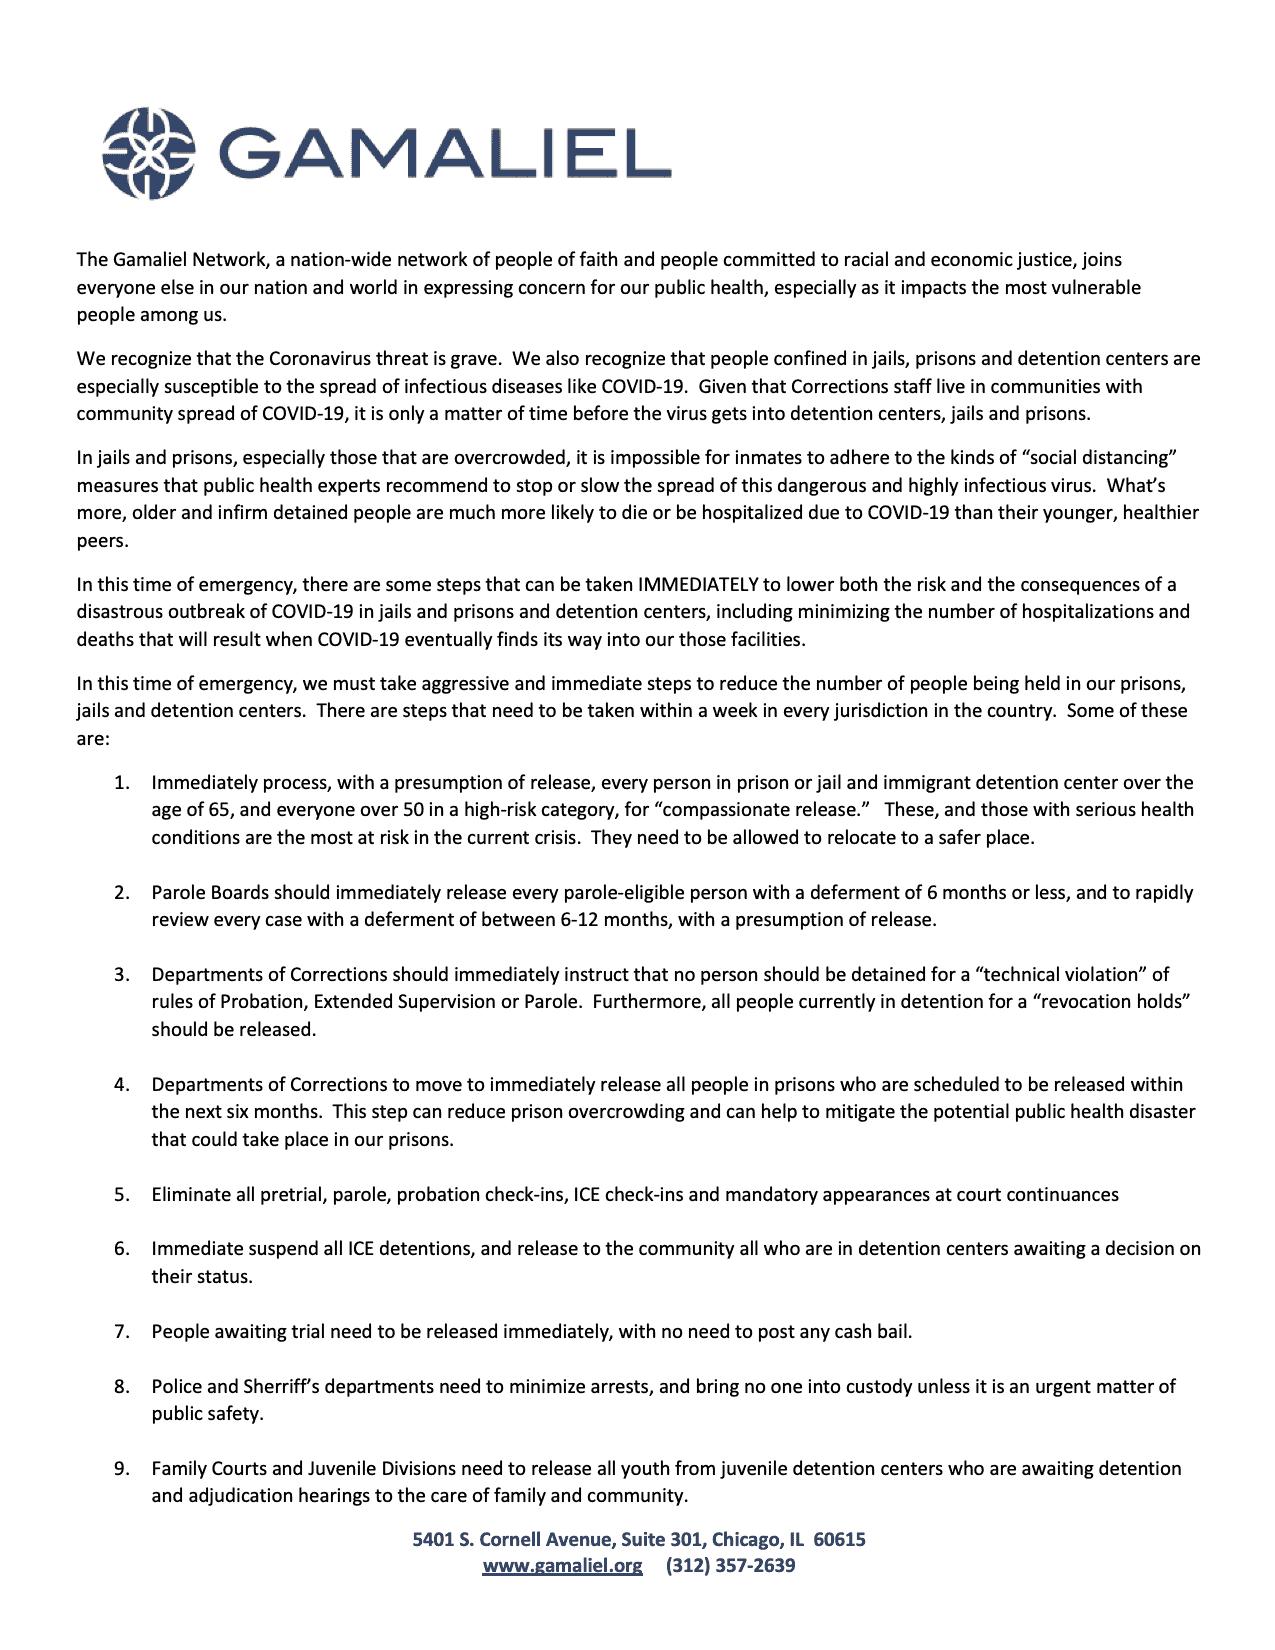 Gamaliel Decarceration Statement March 19, 2020